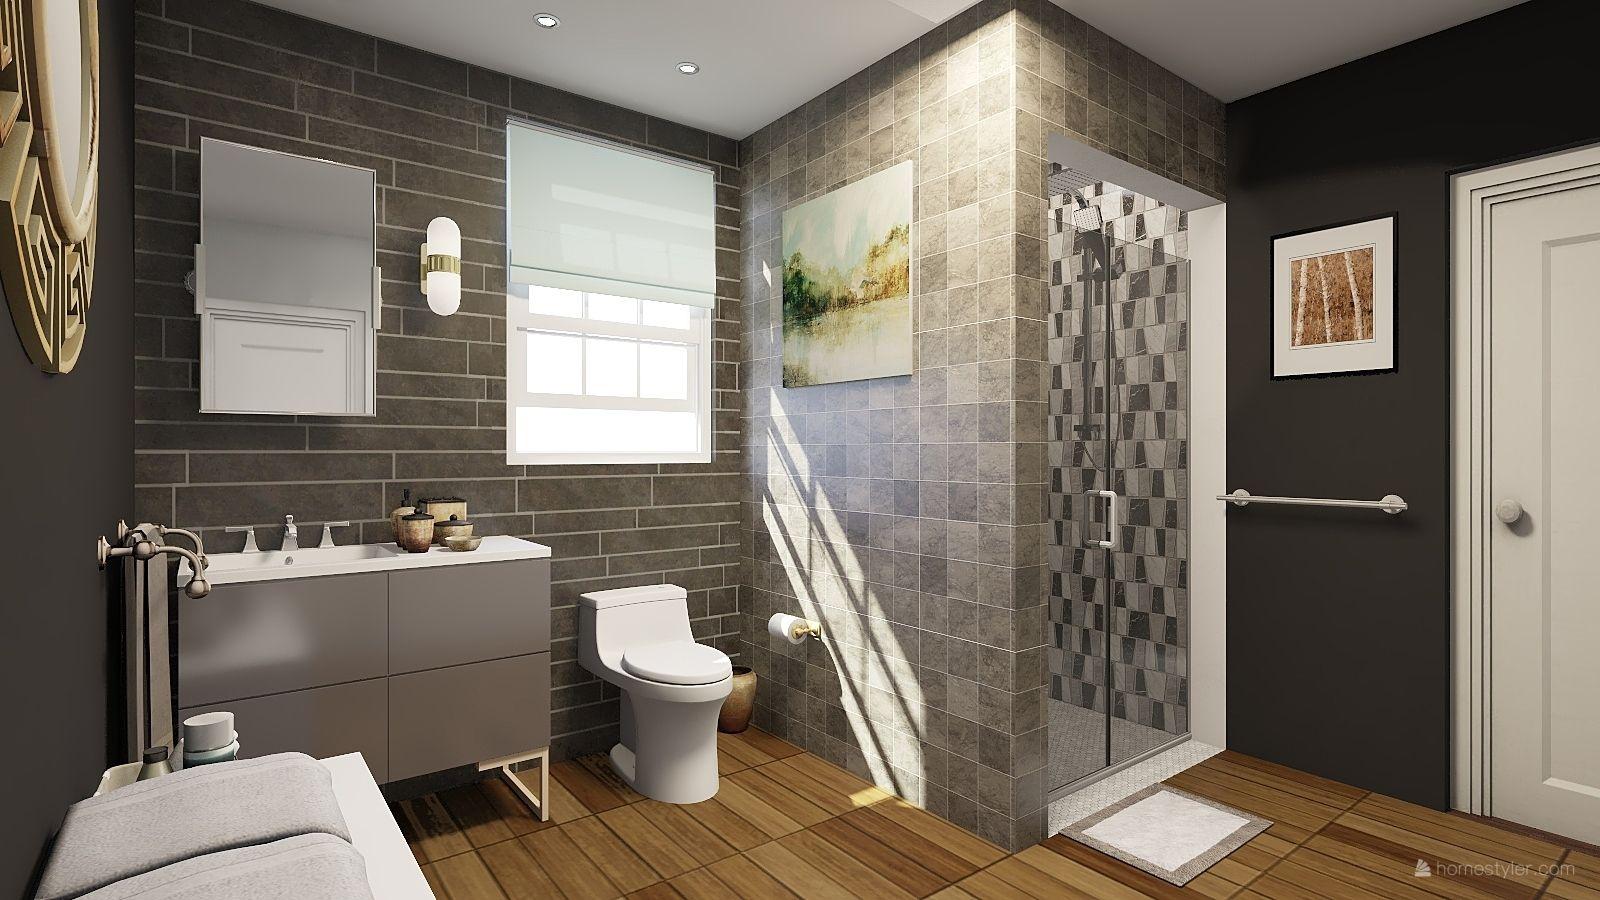 Bathroom Design By Jorge Gutierrez Interiordesign Homedecor Floor Planner 3d Home Design Software Home Design Software